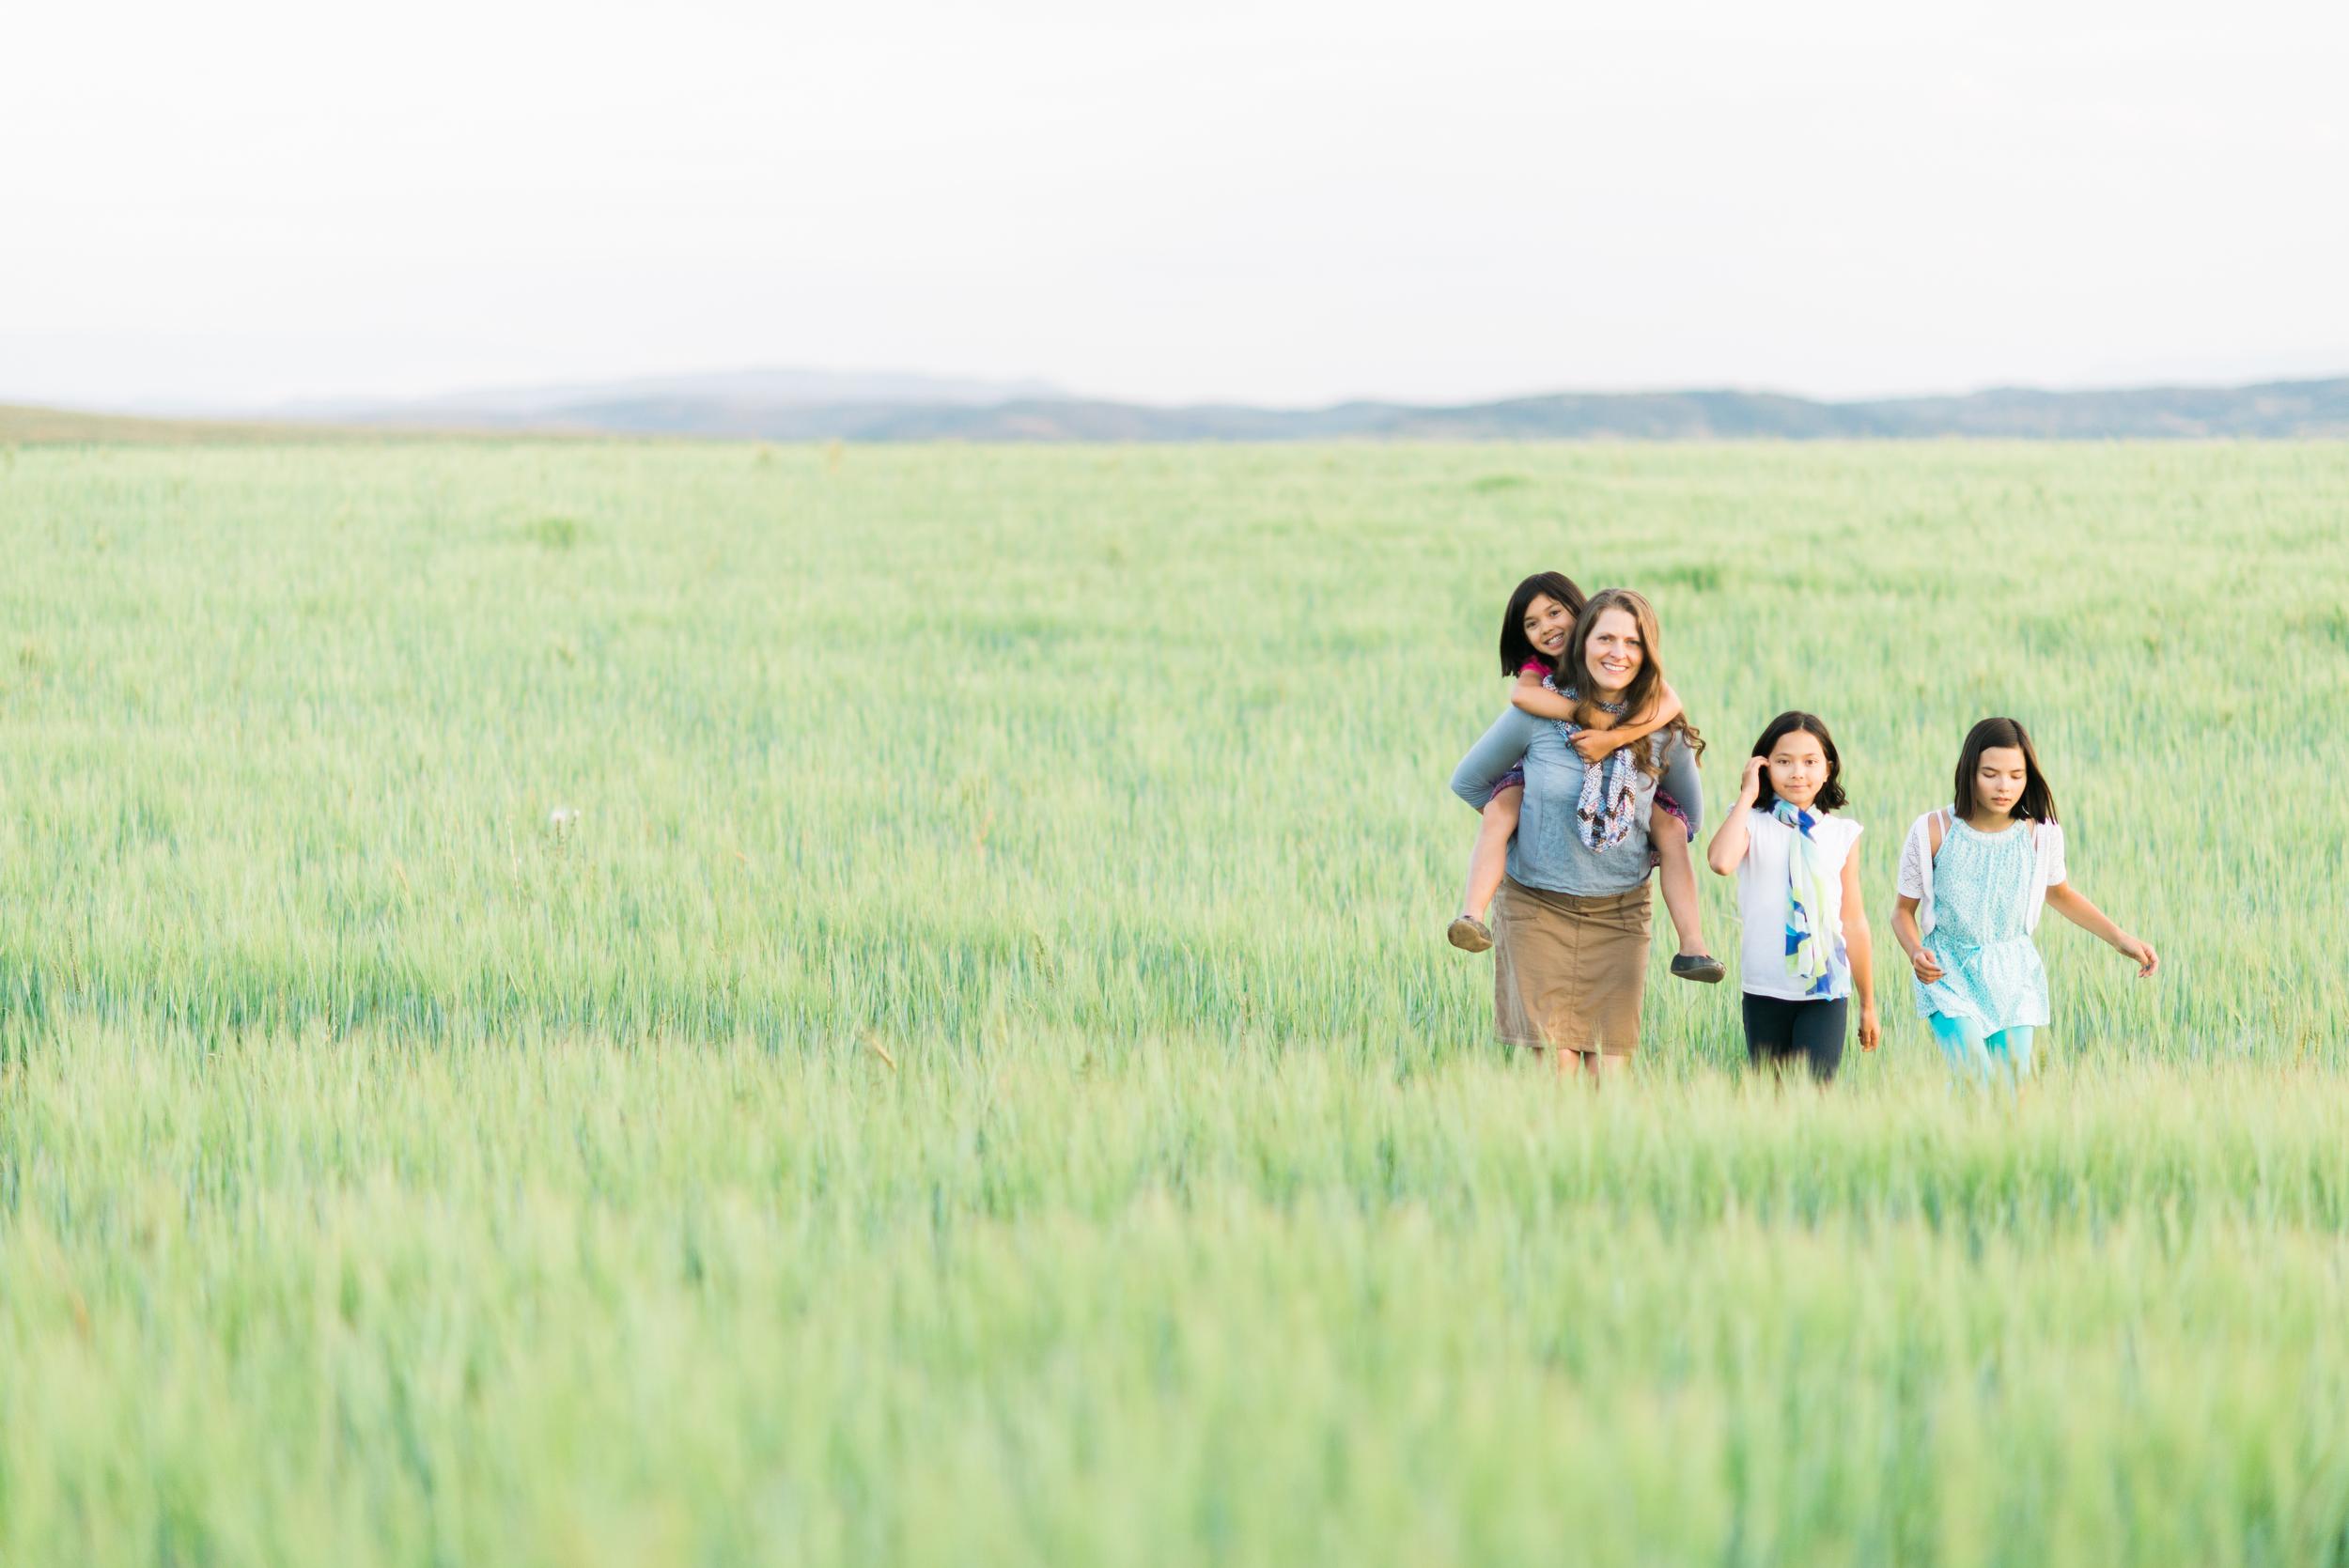 Yamashita_Family_Photos72649.jpg